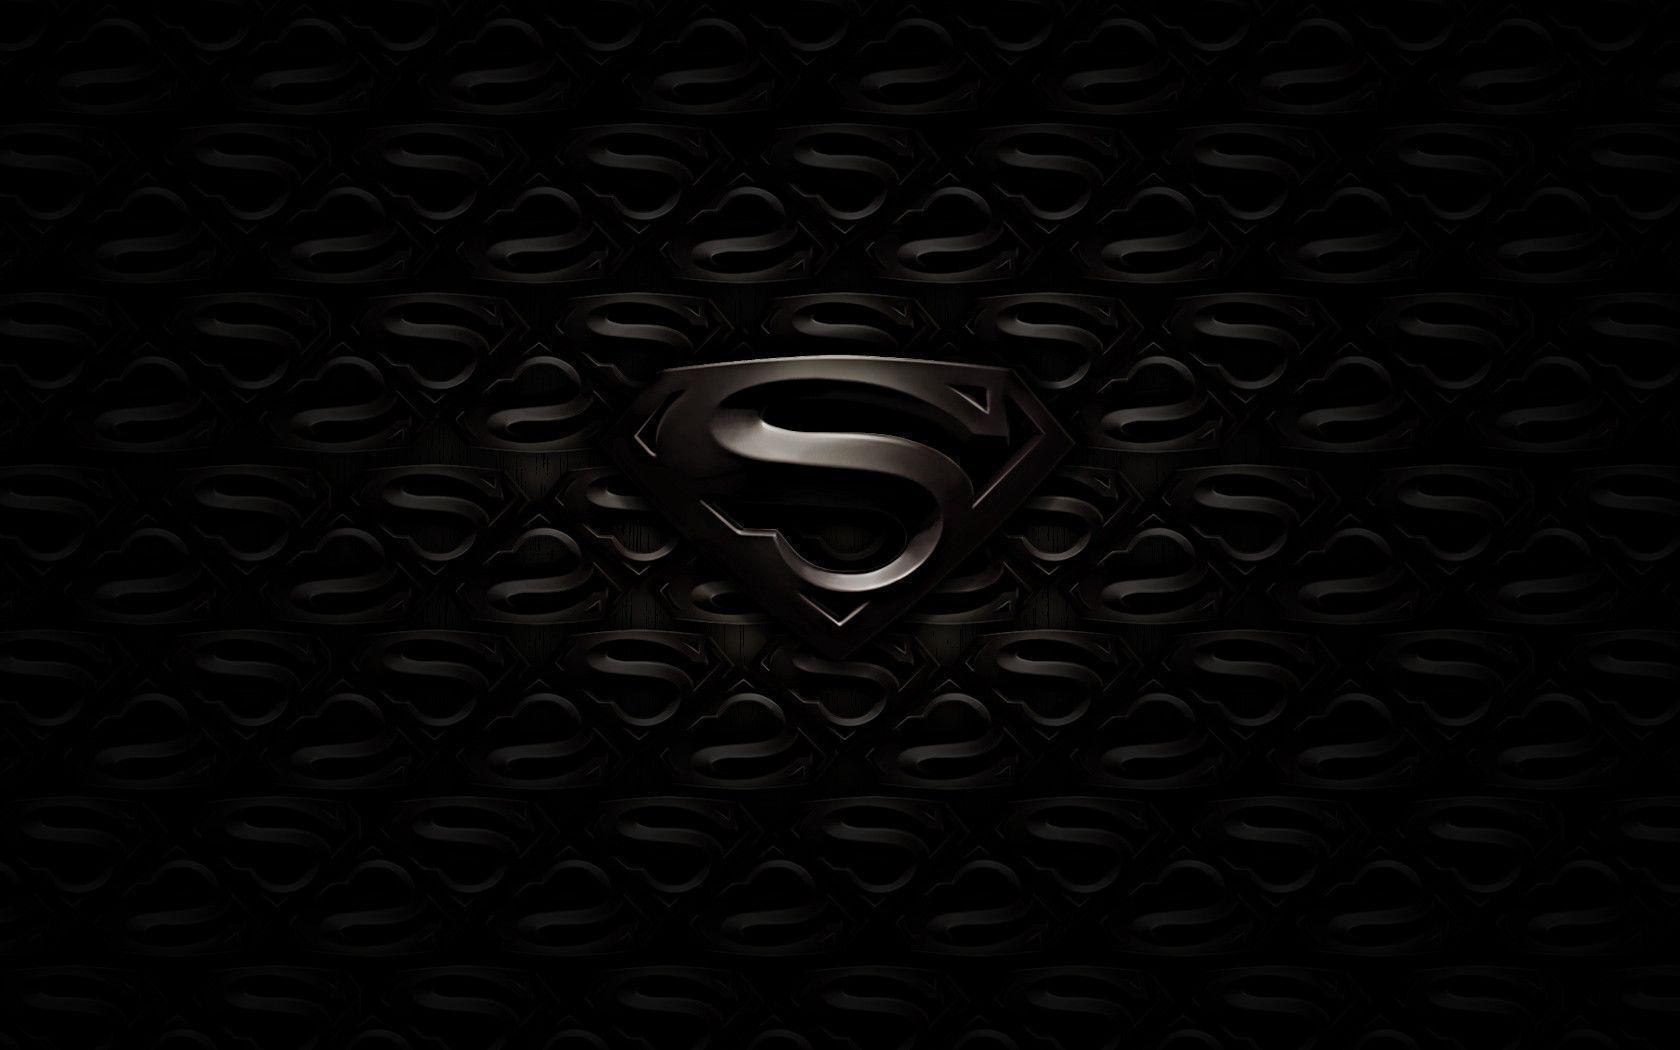 superman logo backgrounds wallpaper cave